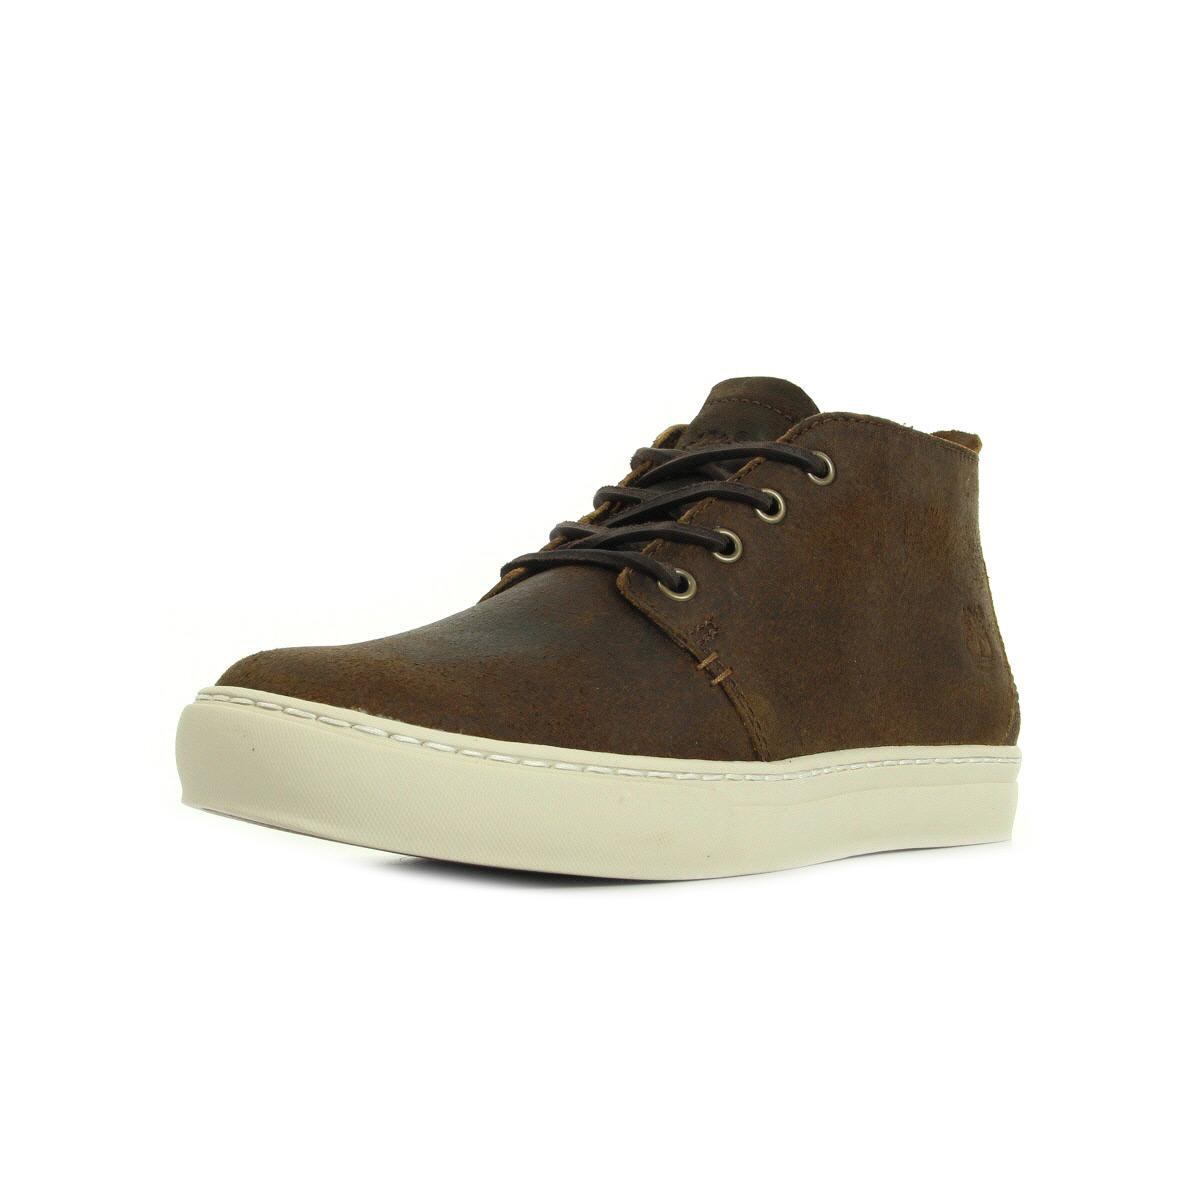 Timberland Chaussures ADVENTURE 2.0 FABRIC ALPI Timberland solde 2QCvguDcQ